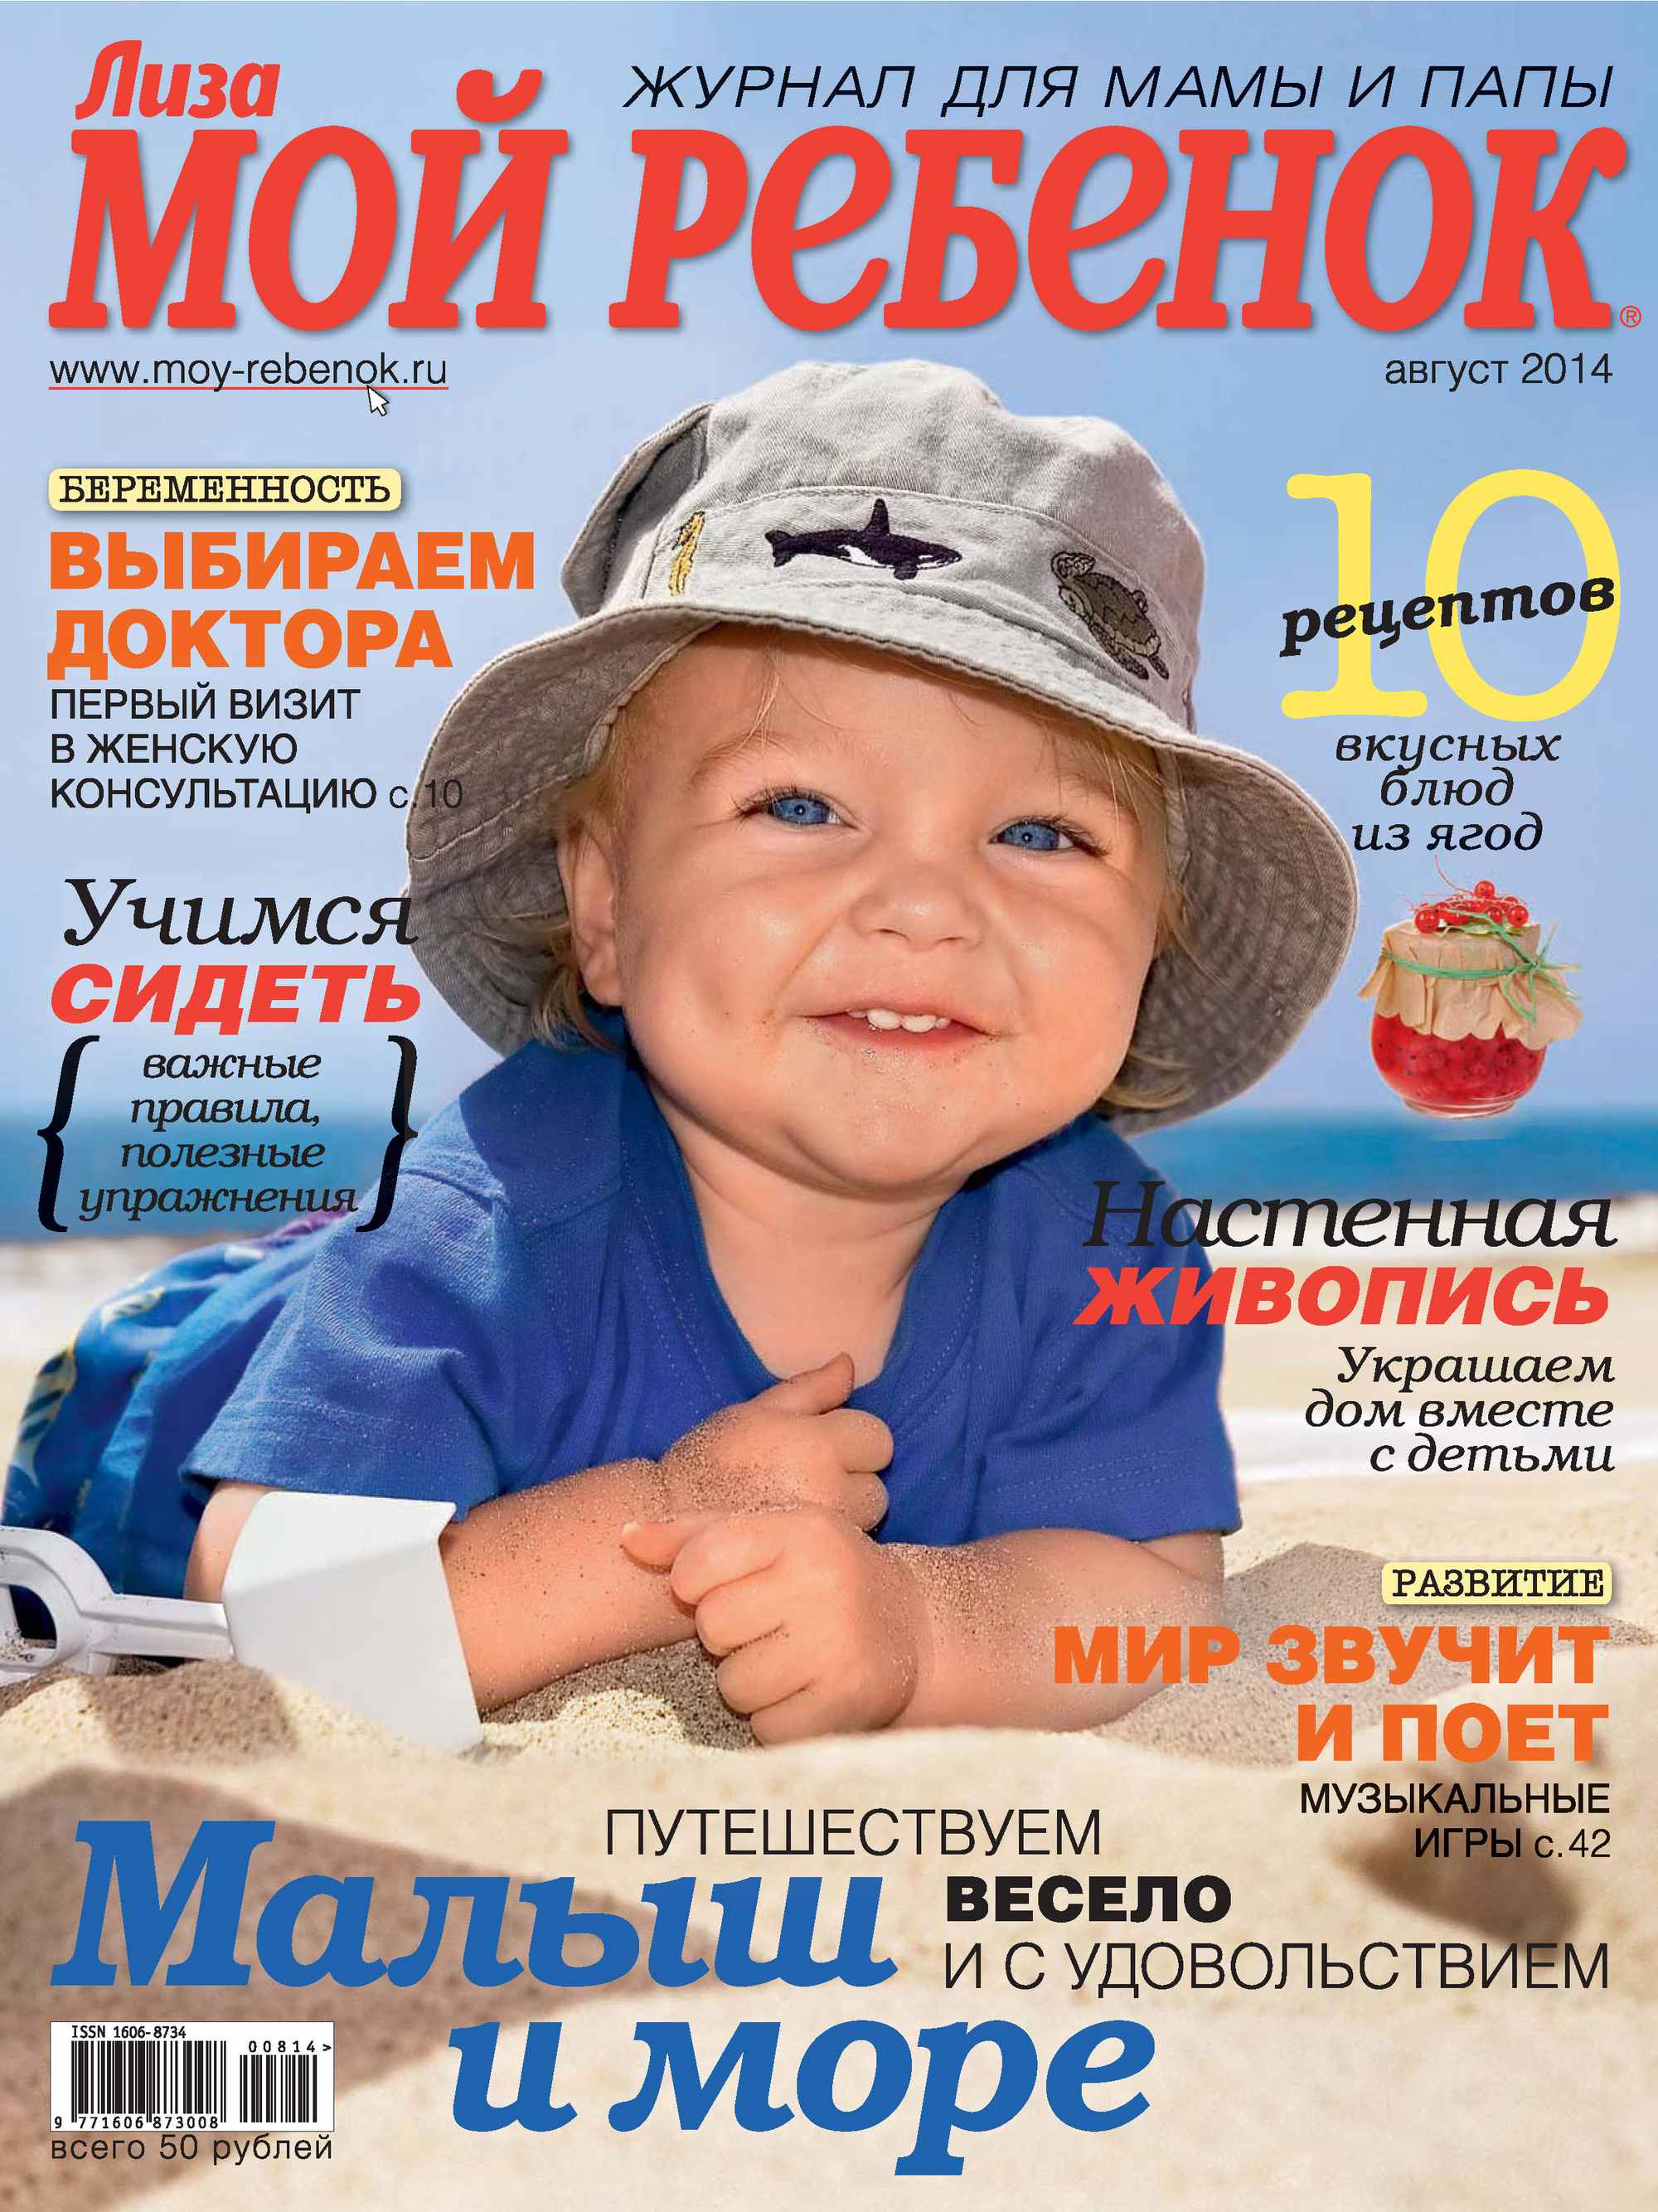 ИД «Бурда» Журнал «Лиза. Мой ребенок» №08/2014 ид бурда журнал лиза мой ребенок 03 2014